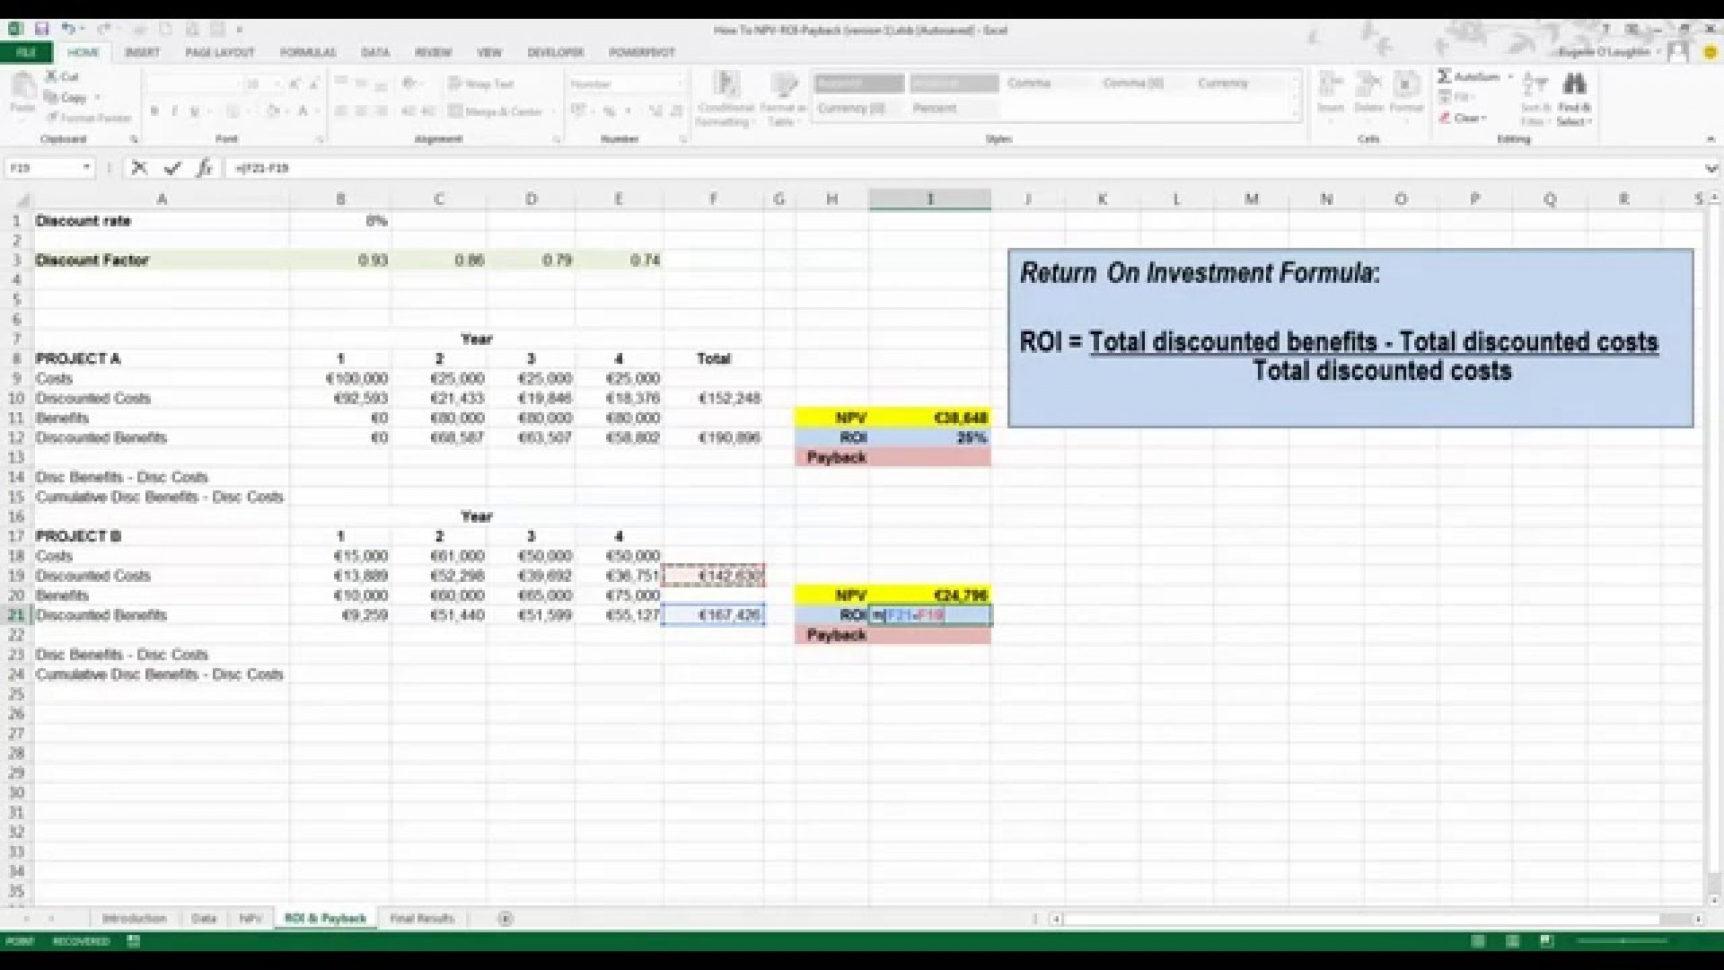 Test Automation Roi Calculation Spreadsheet Inside 025 Template Ideas Roi Calculator Excel ~ Ulyssesroom